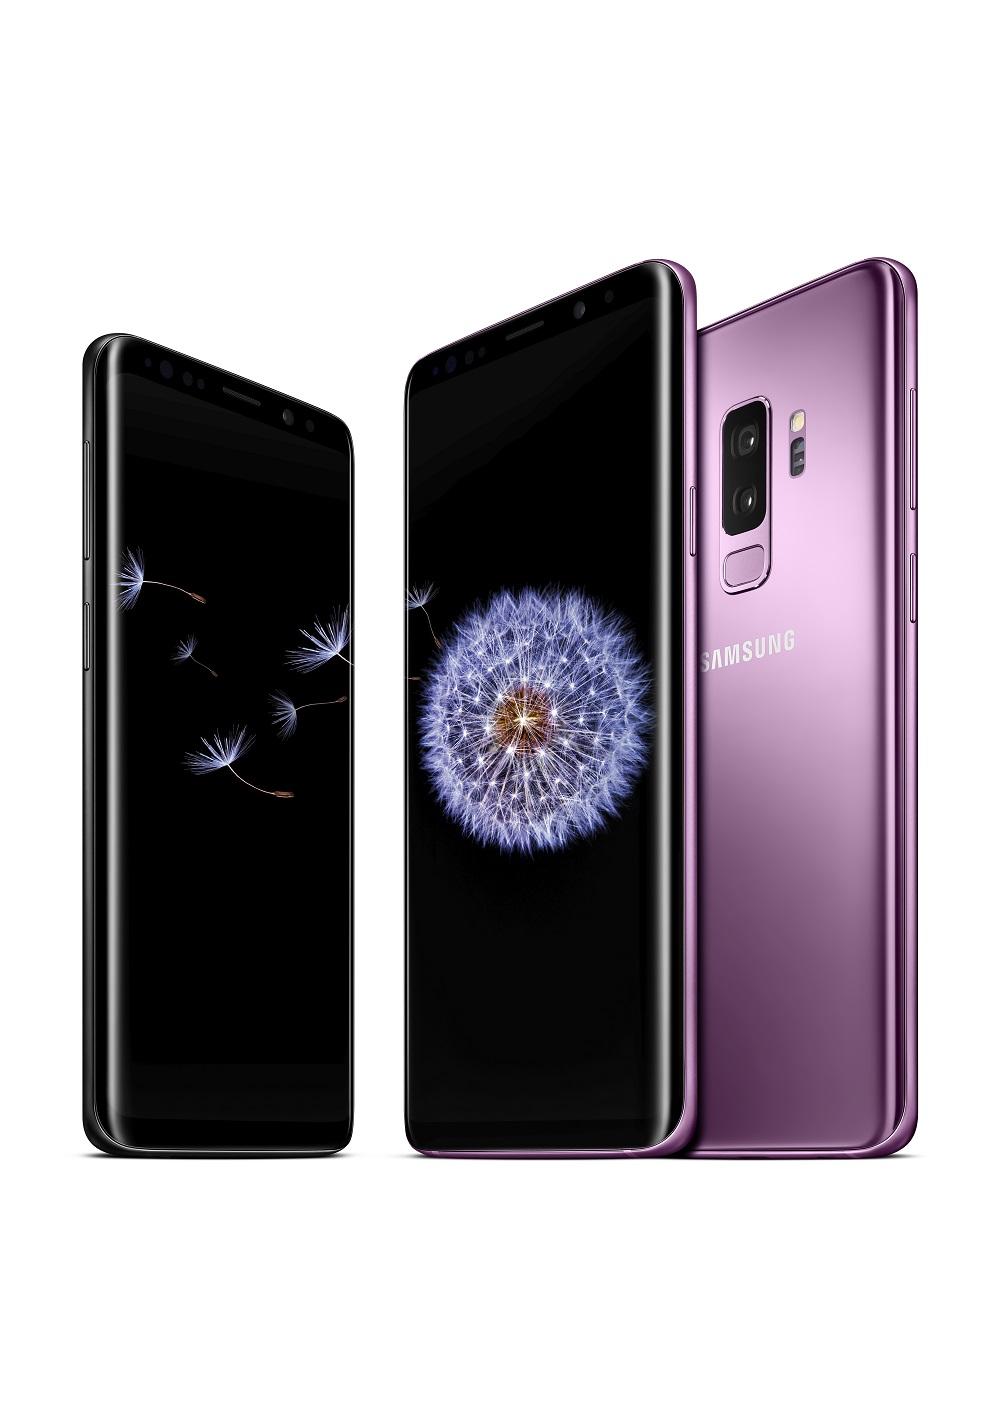 Samsung очаква да продаде 43 милиона броя Galaxy S9